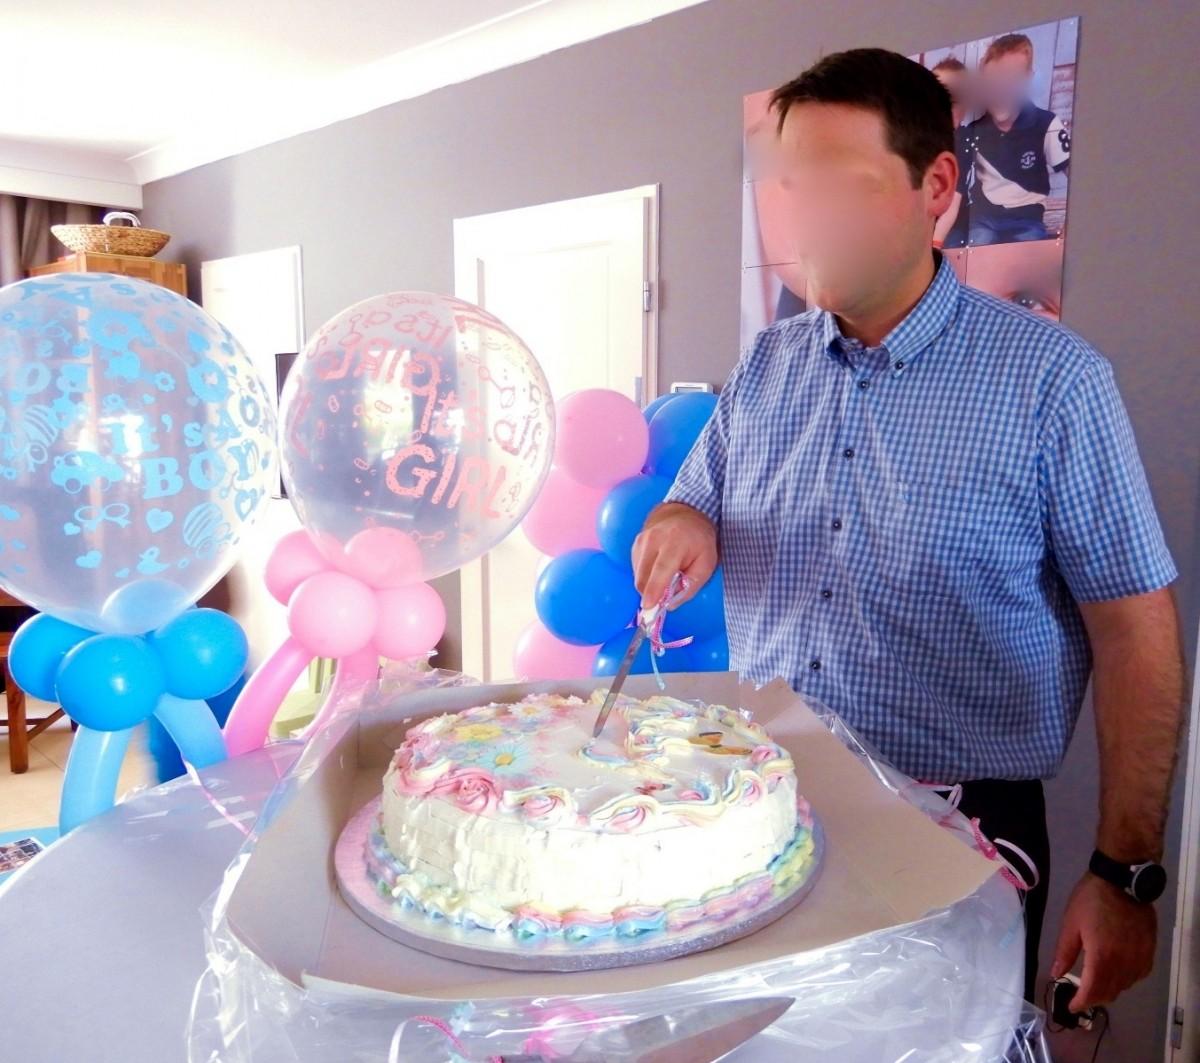 Balloon Styling baby fopspeen gender reveal decoratie babyshower babykraam